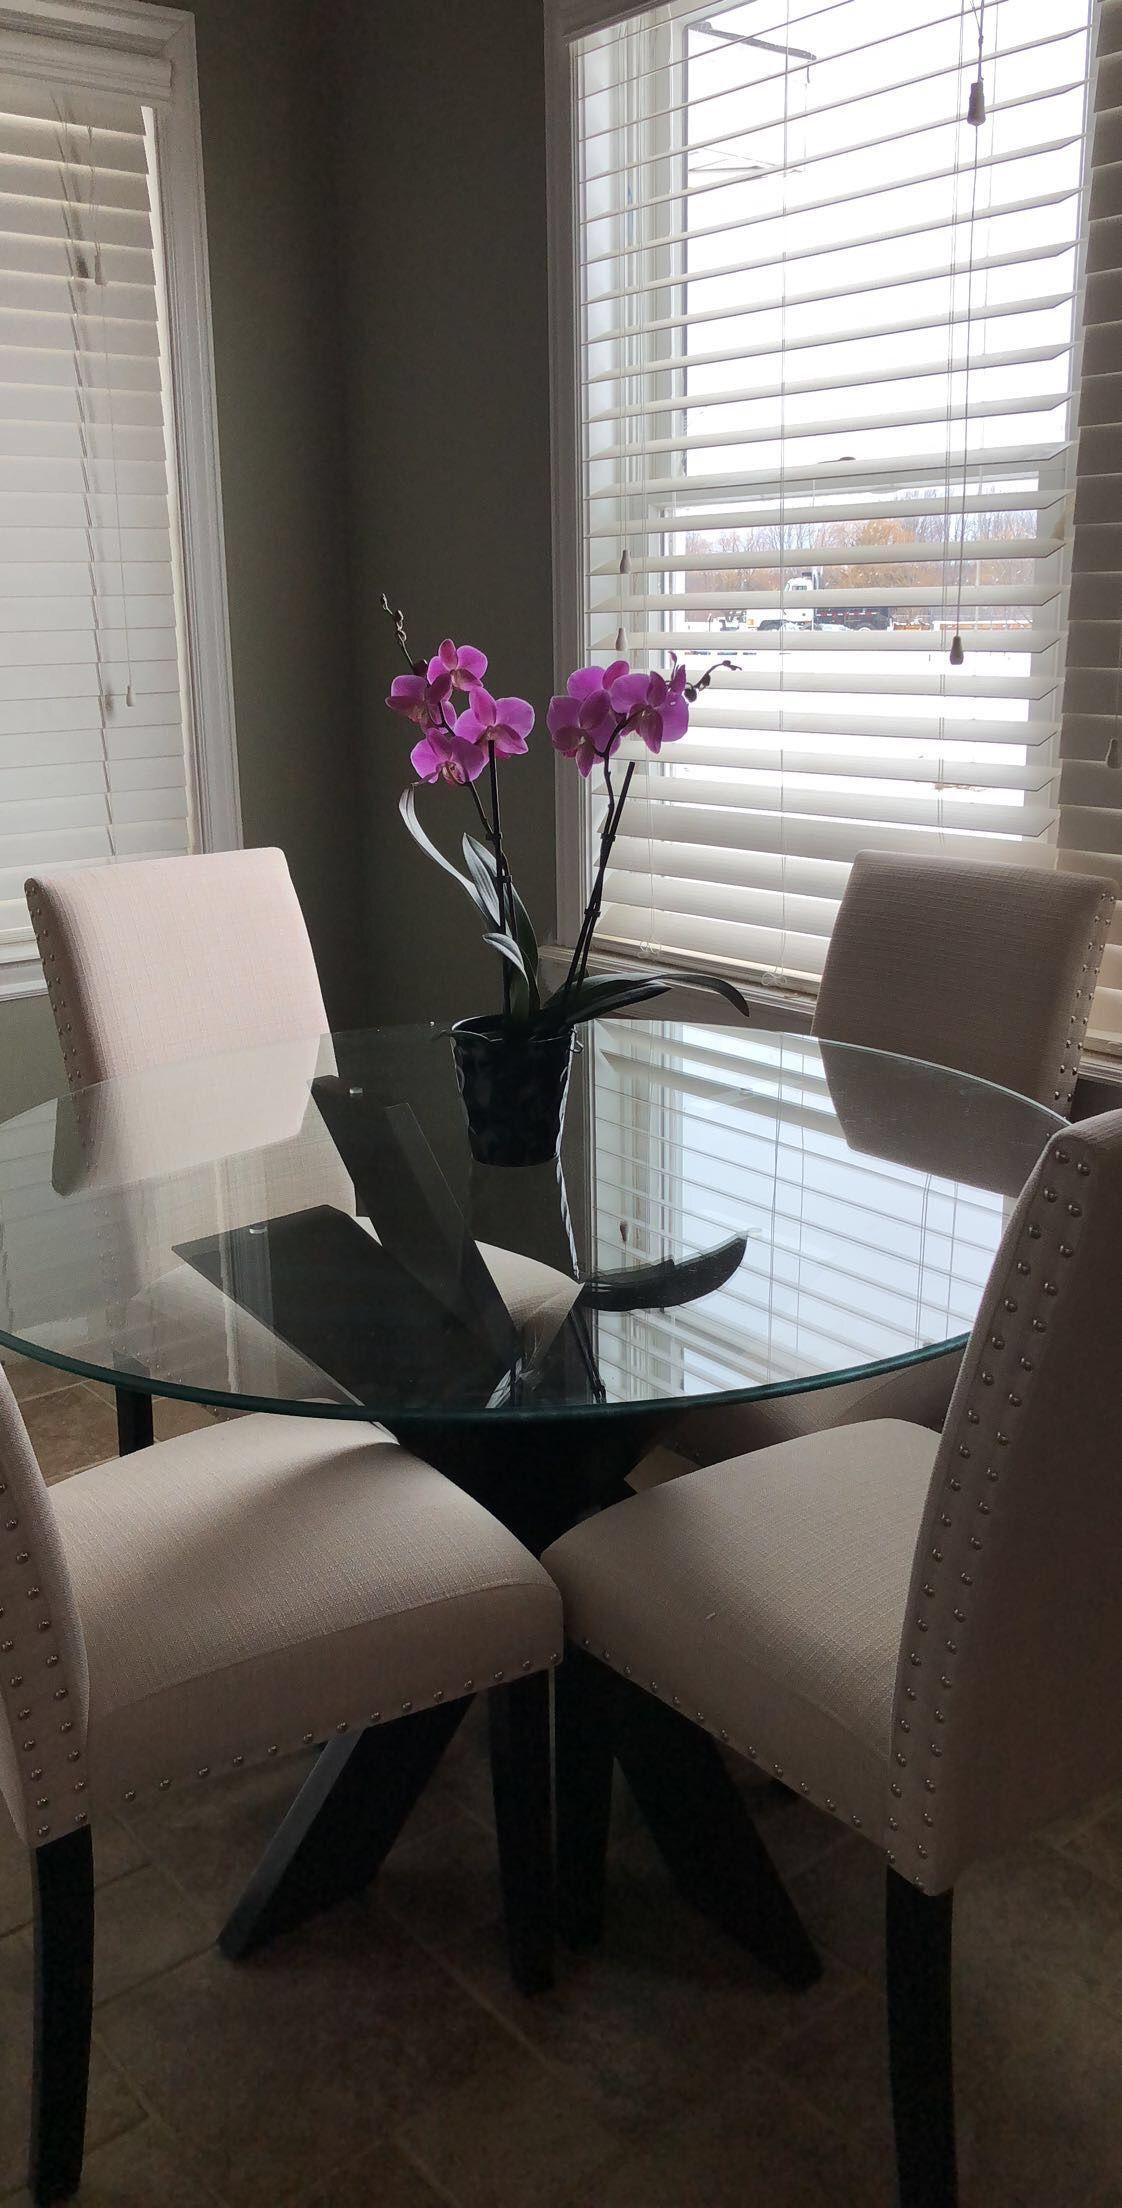 Pier 1 Imports Simon X Espresso Orchids Kitchen Round Glass Table